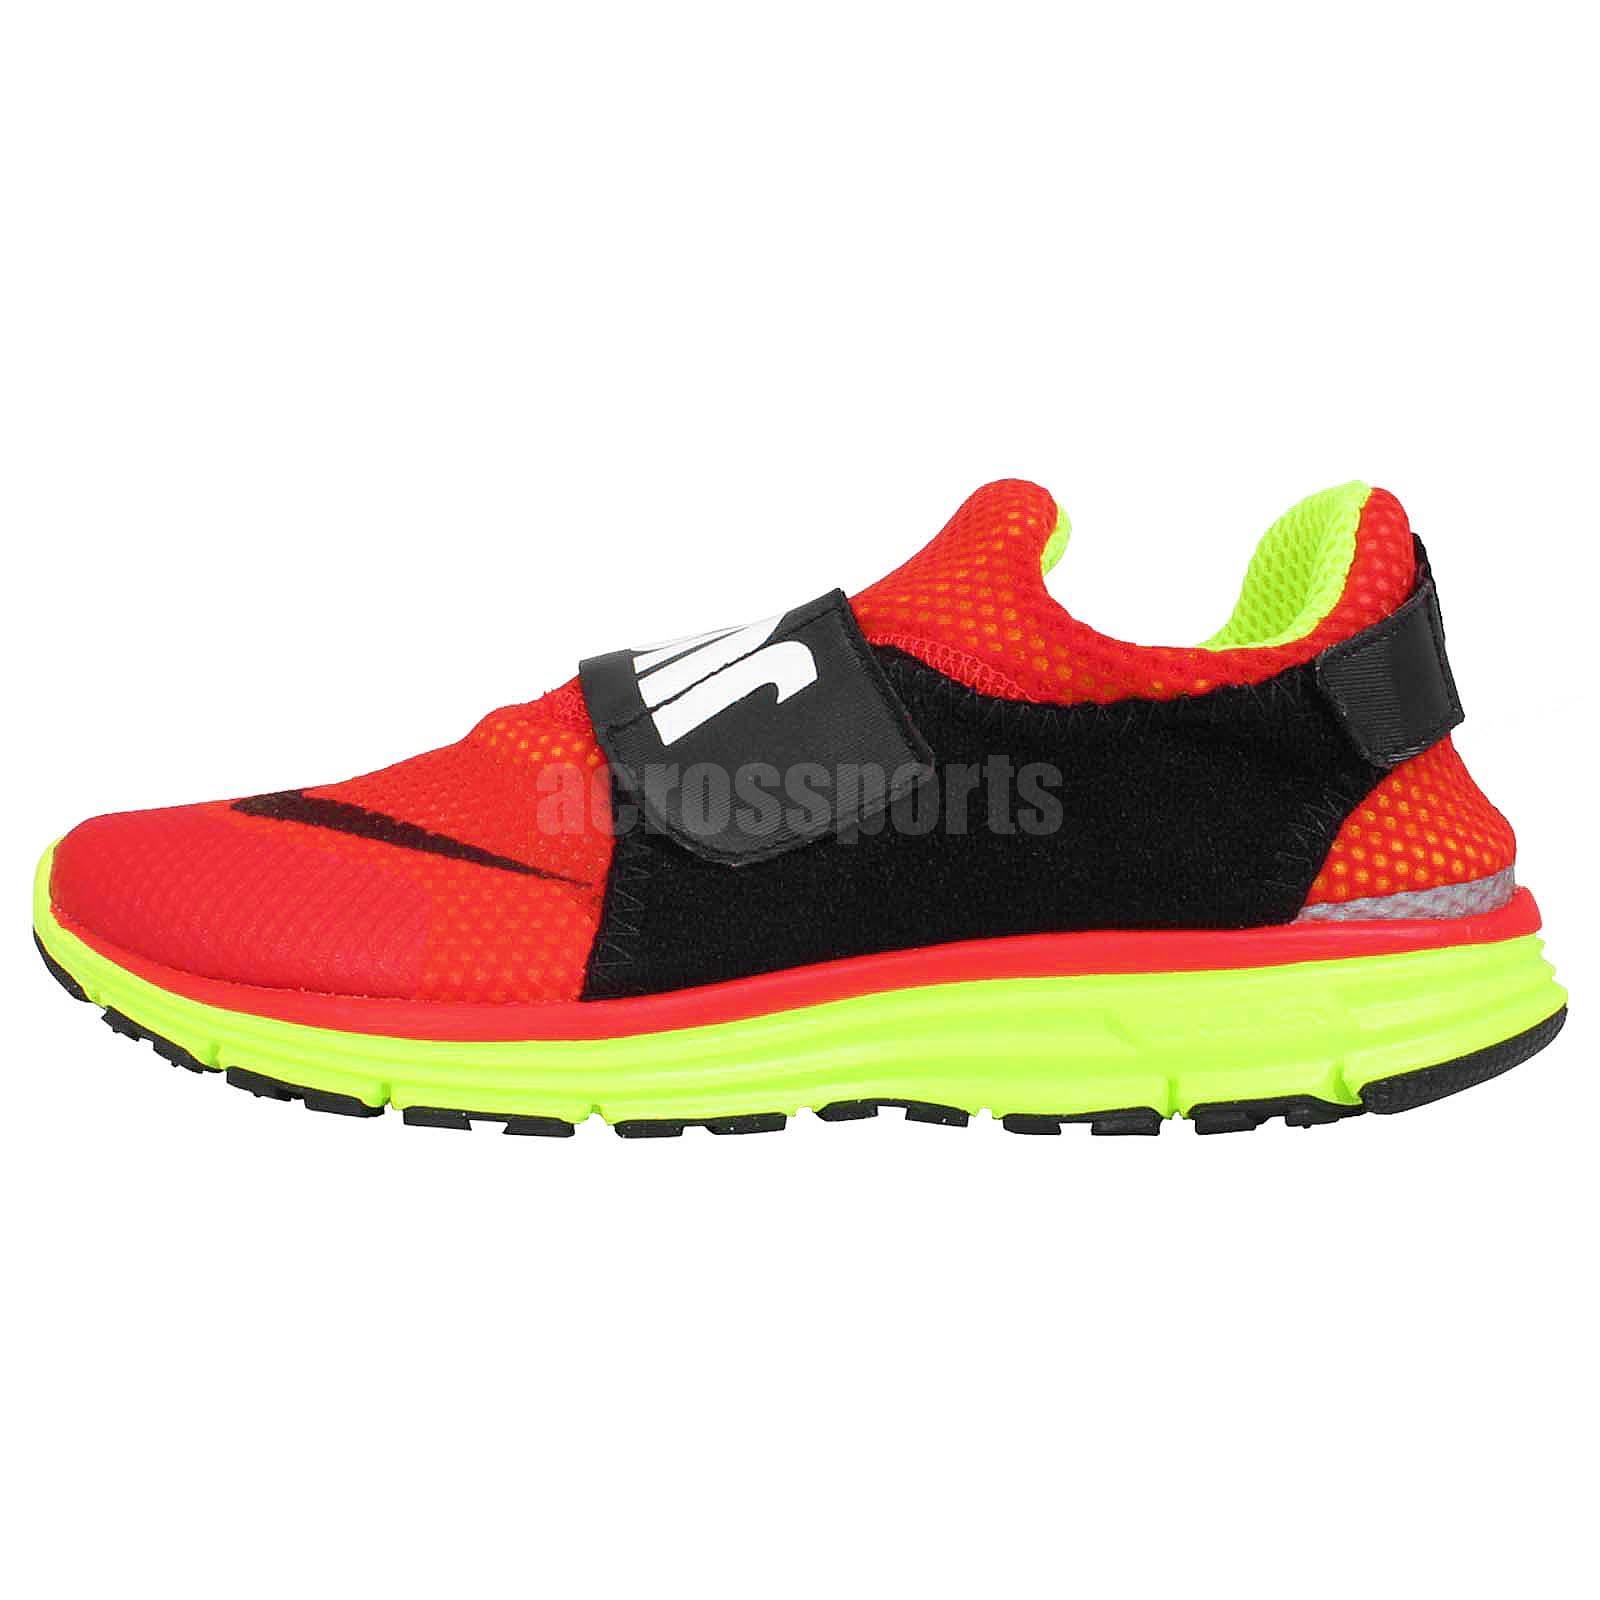 Nike Lunarfly 306 QS Red Black Volt Just Do It Velcro Mens ...